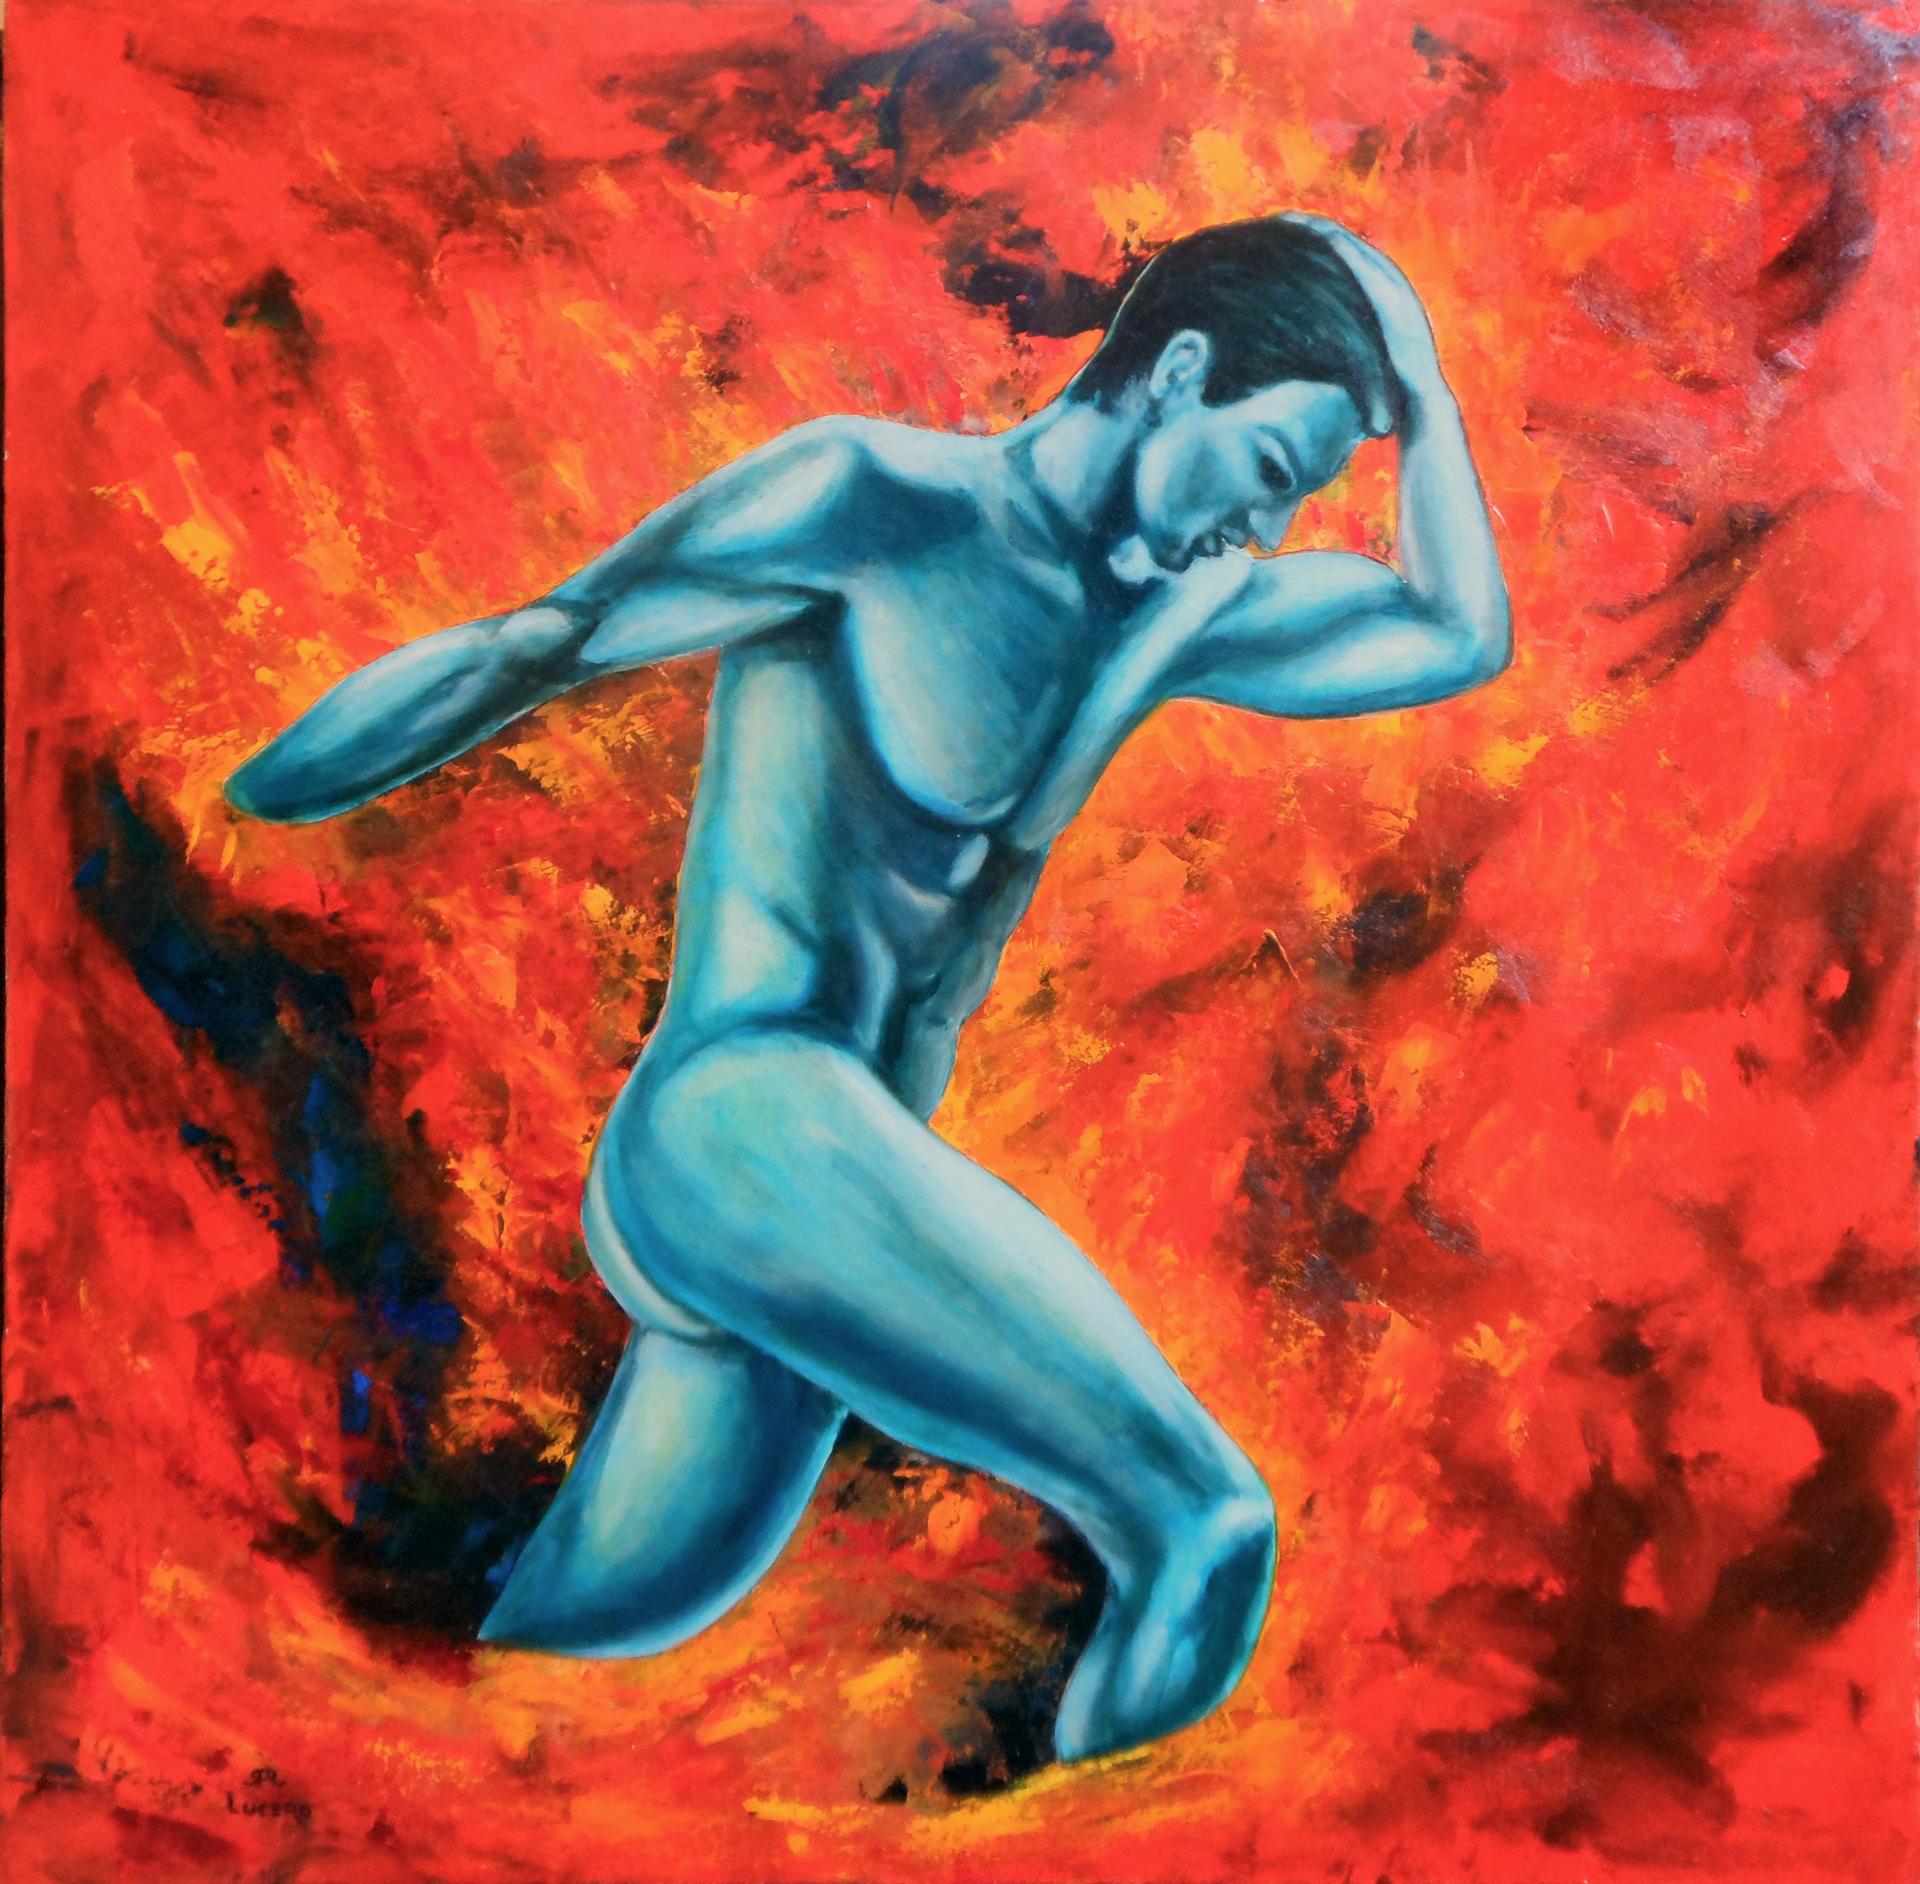 Blue Man on Fire